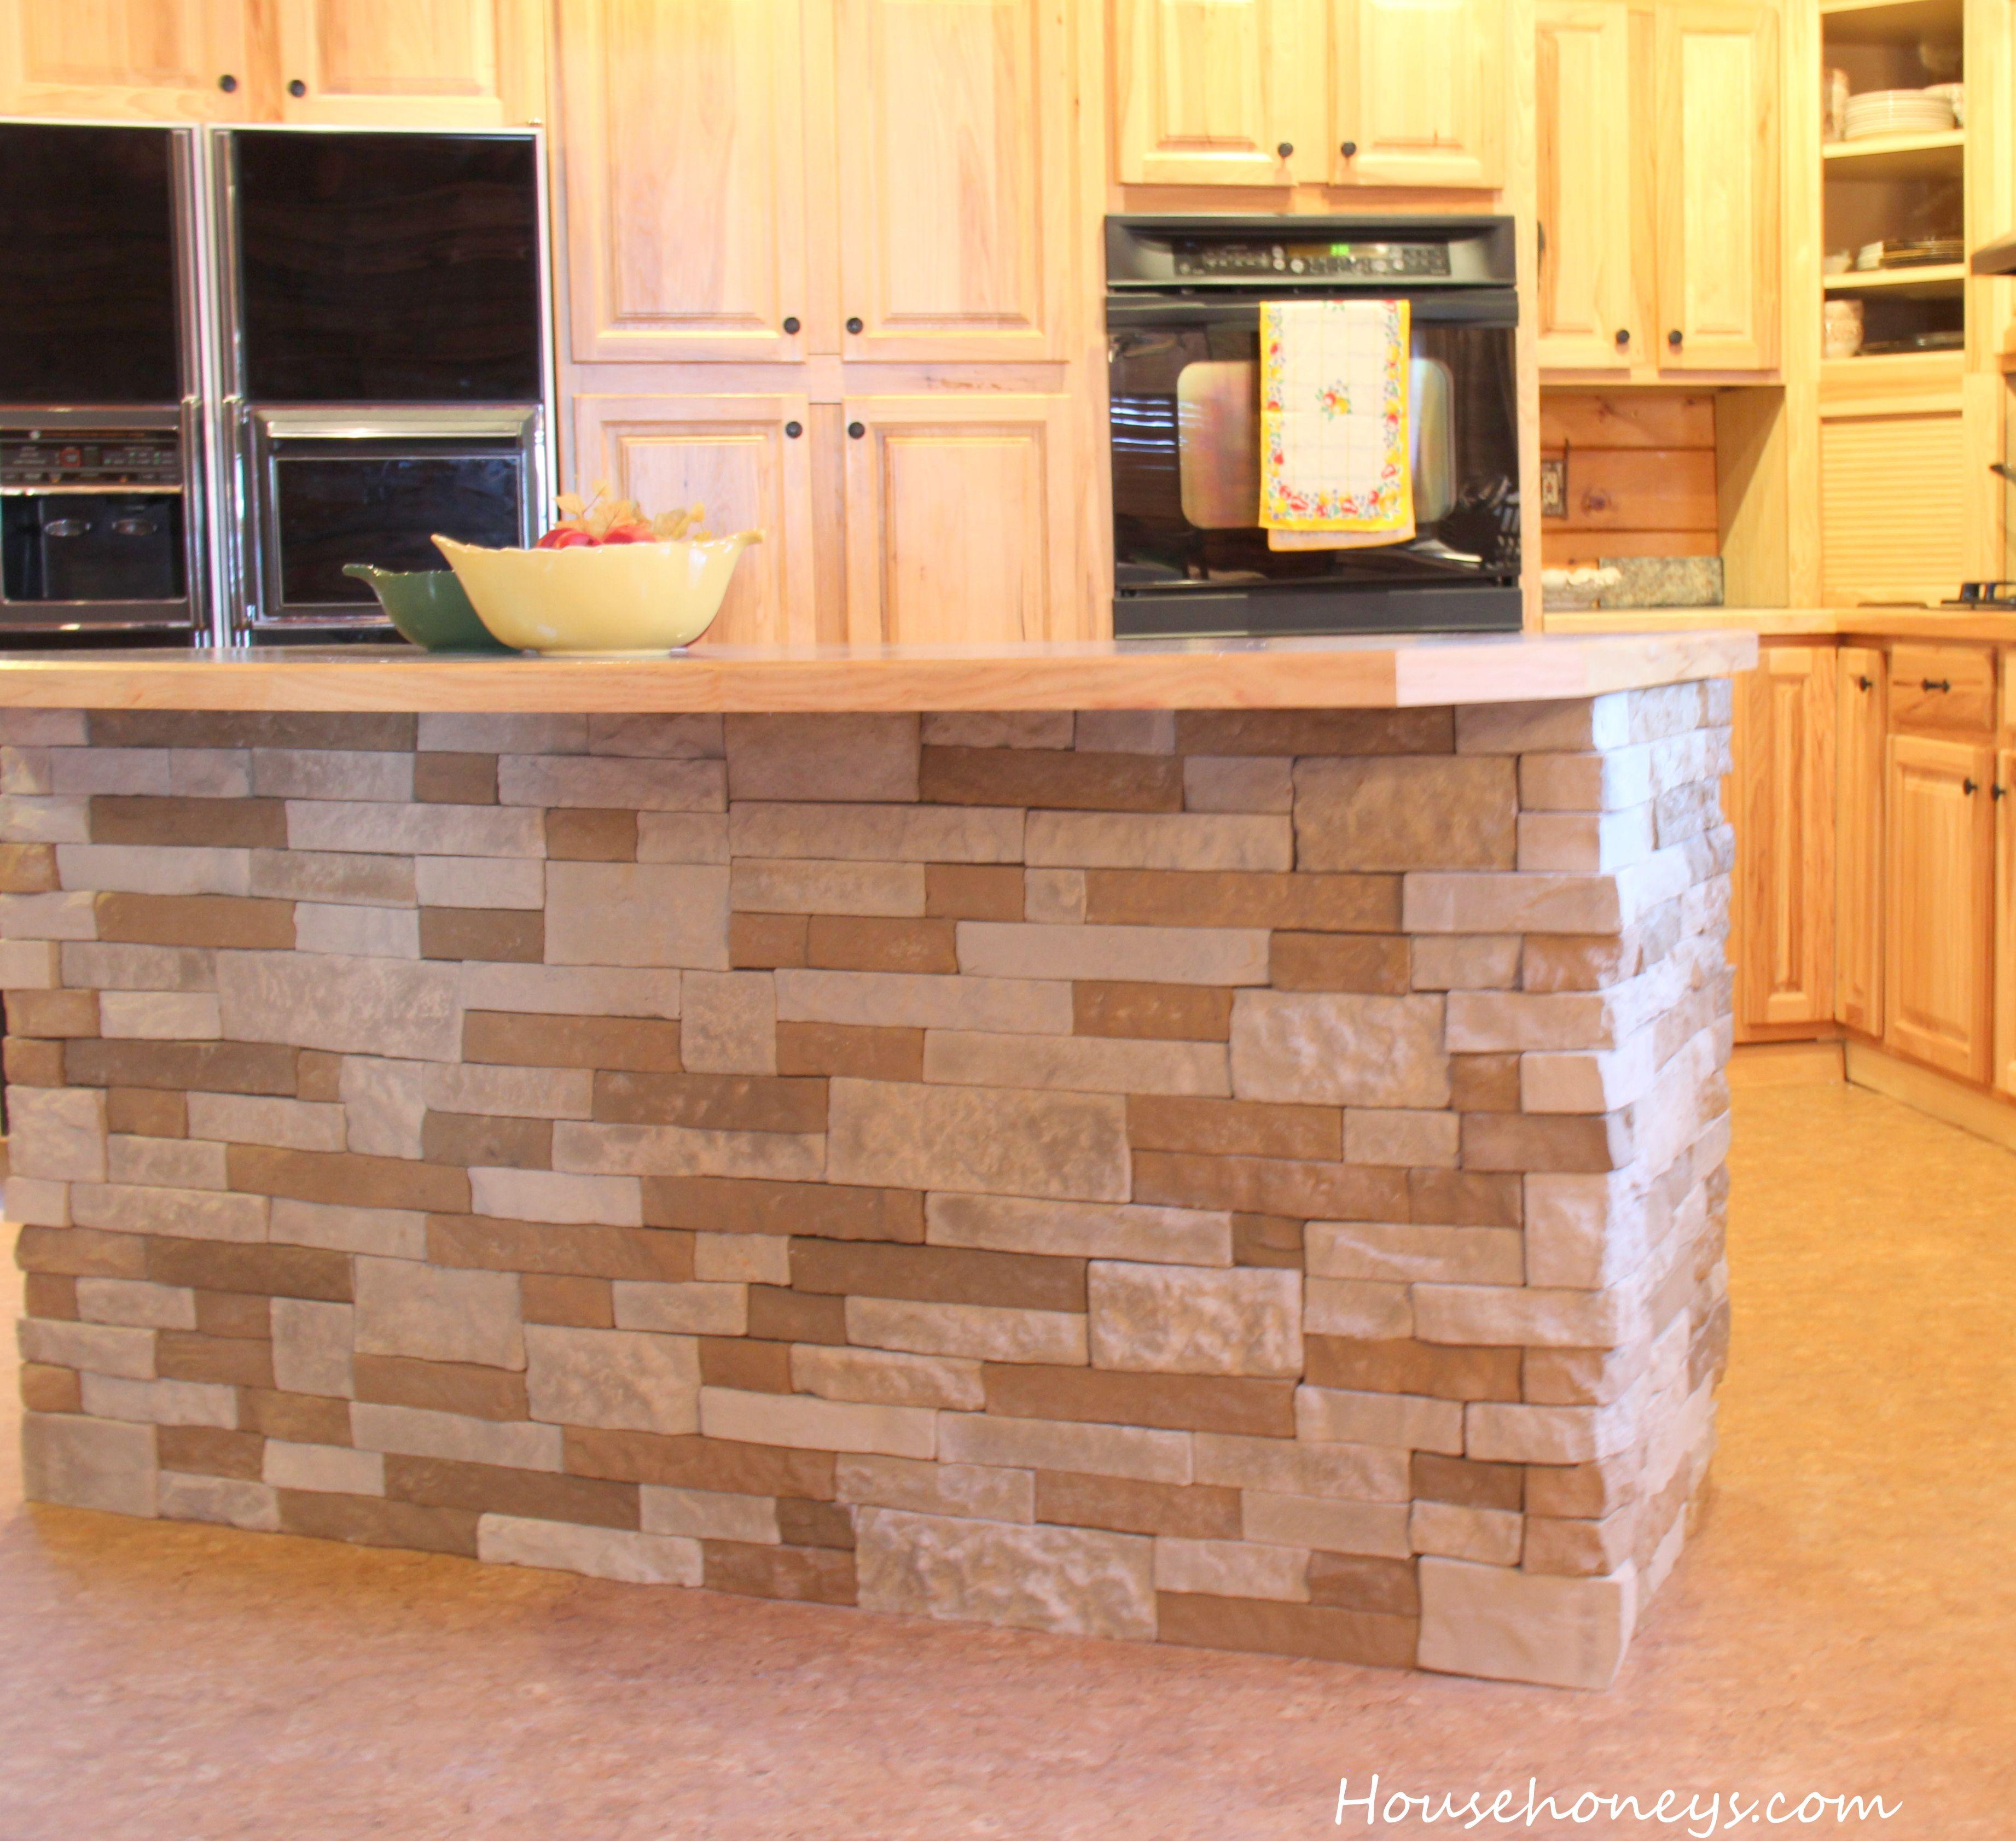 Kitchen Island Using Airstone Kitchen Backsplash Lowes